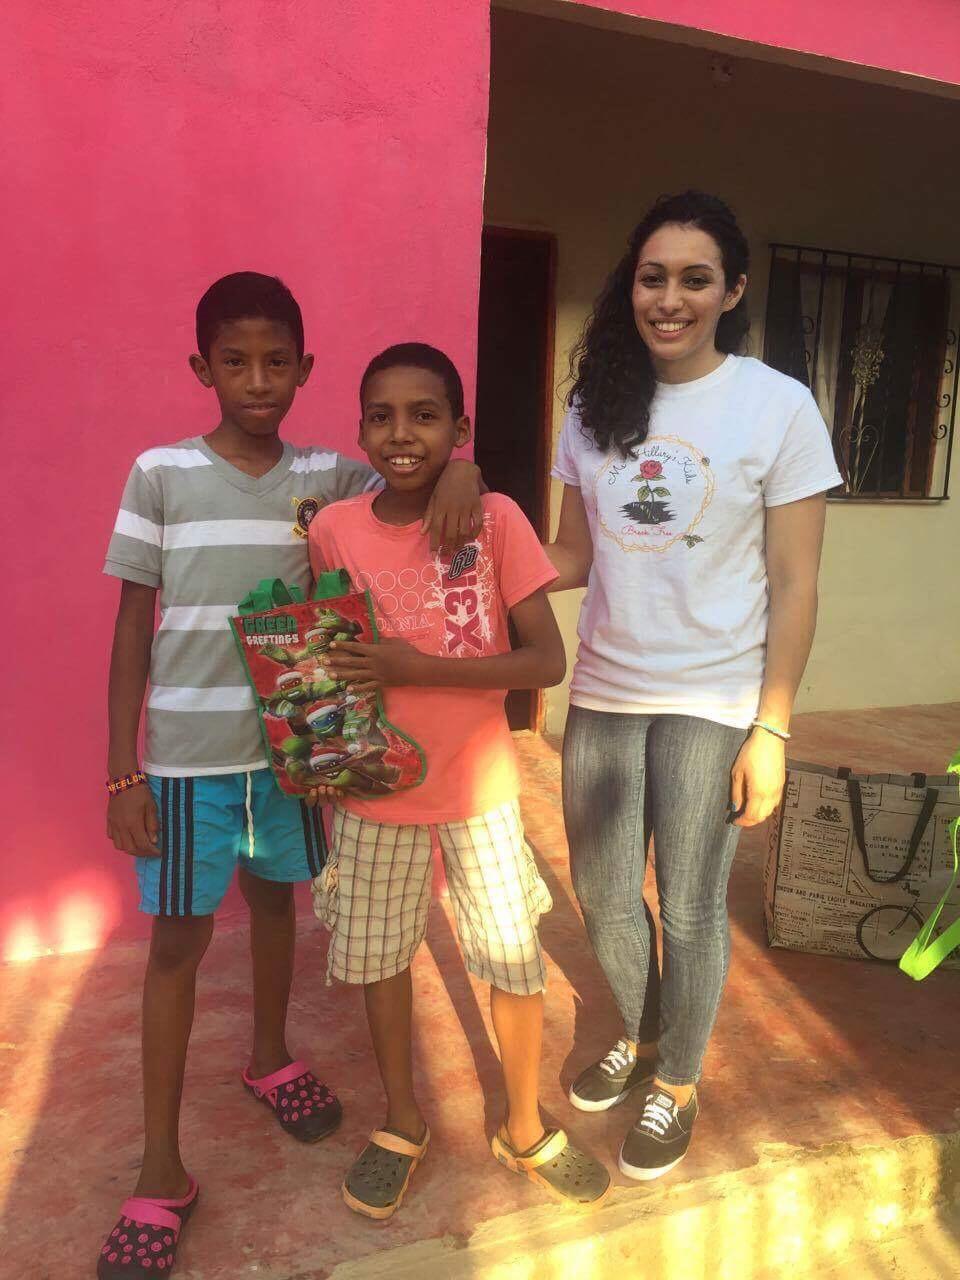 Mentee Arleen giving back in Colombia 2